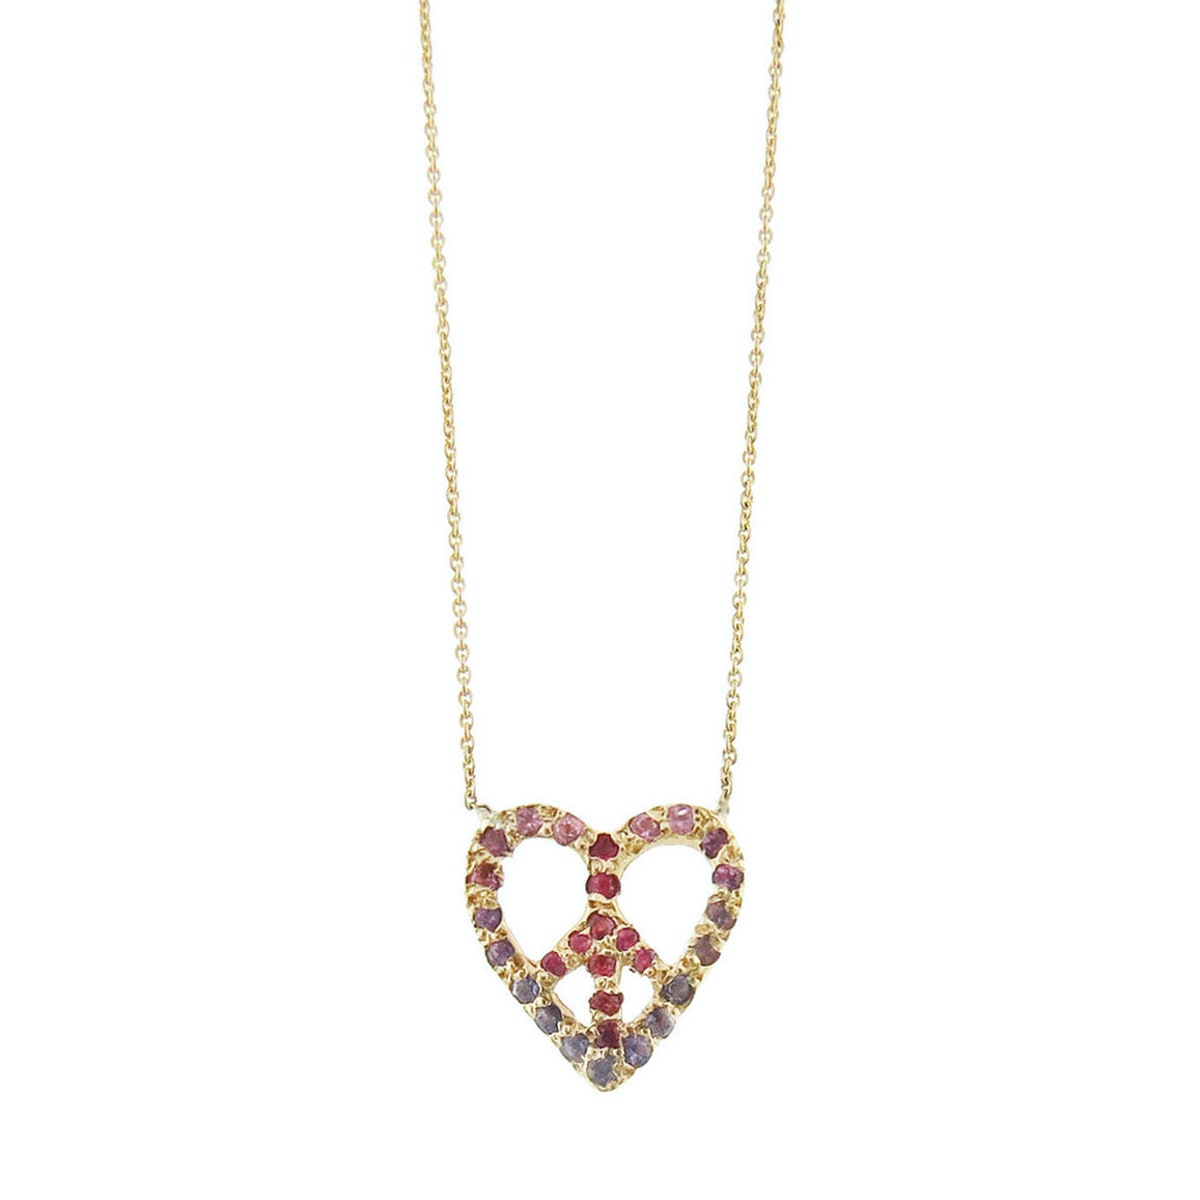 Elisa Soloman necklace, $1,420, ylang23.com